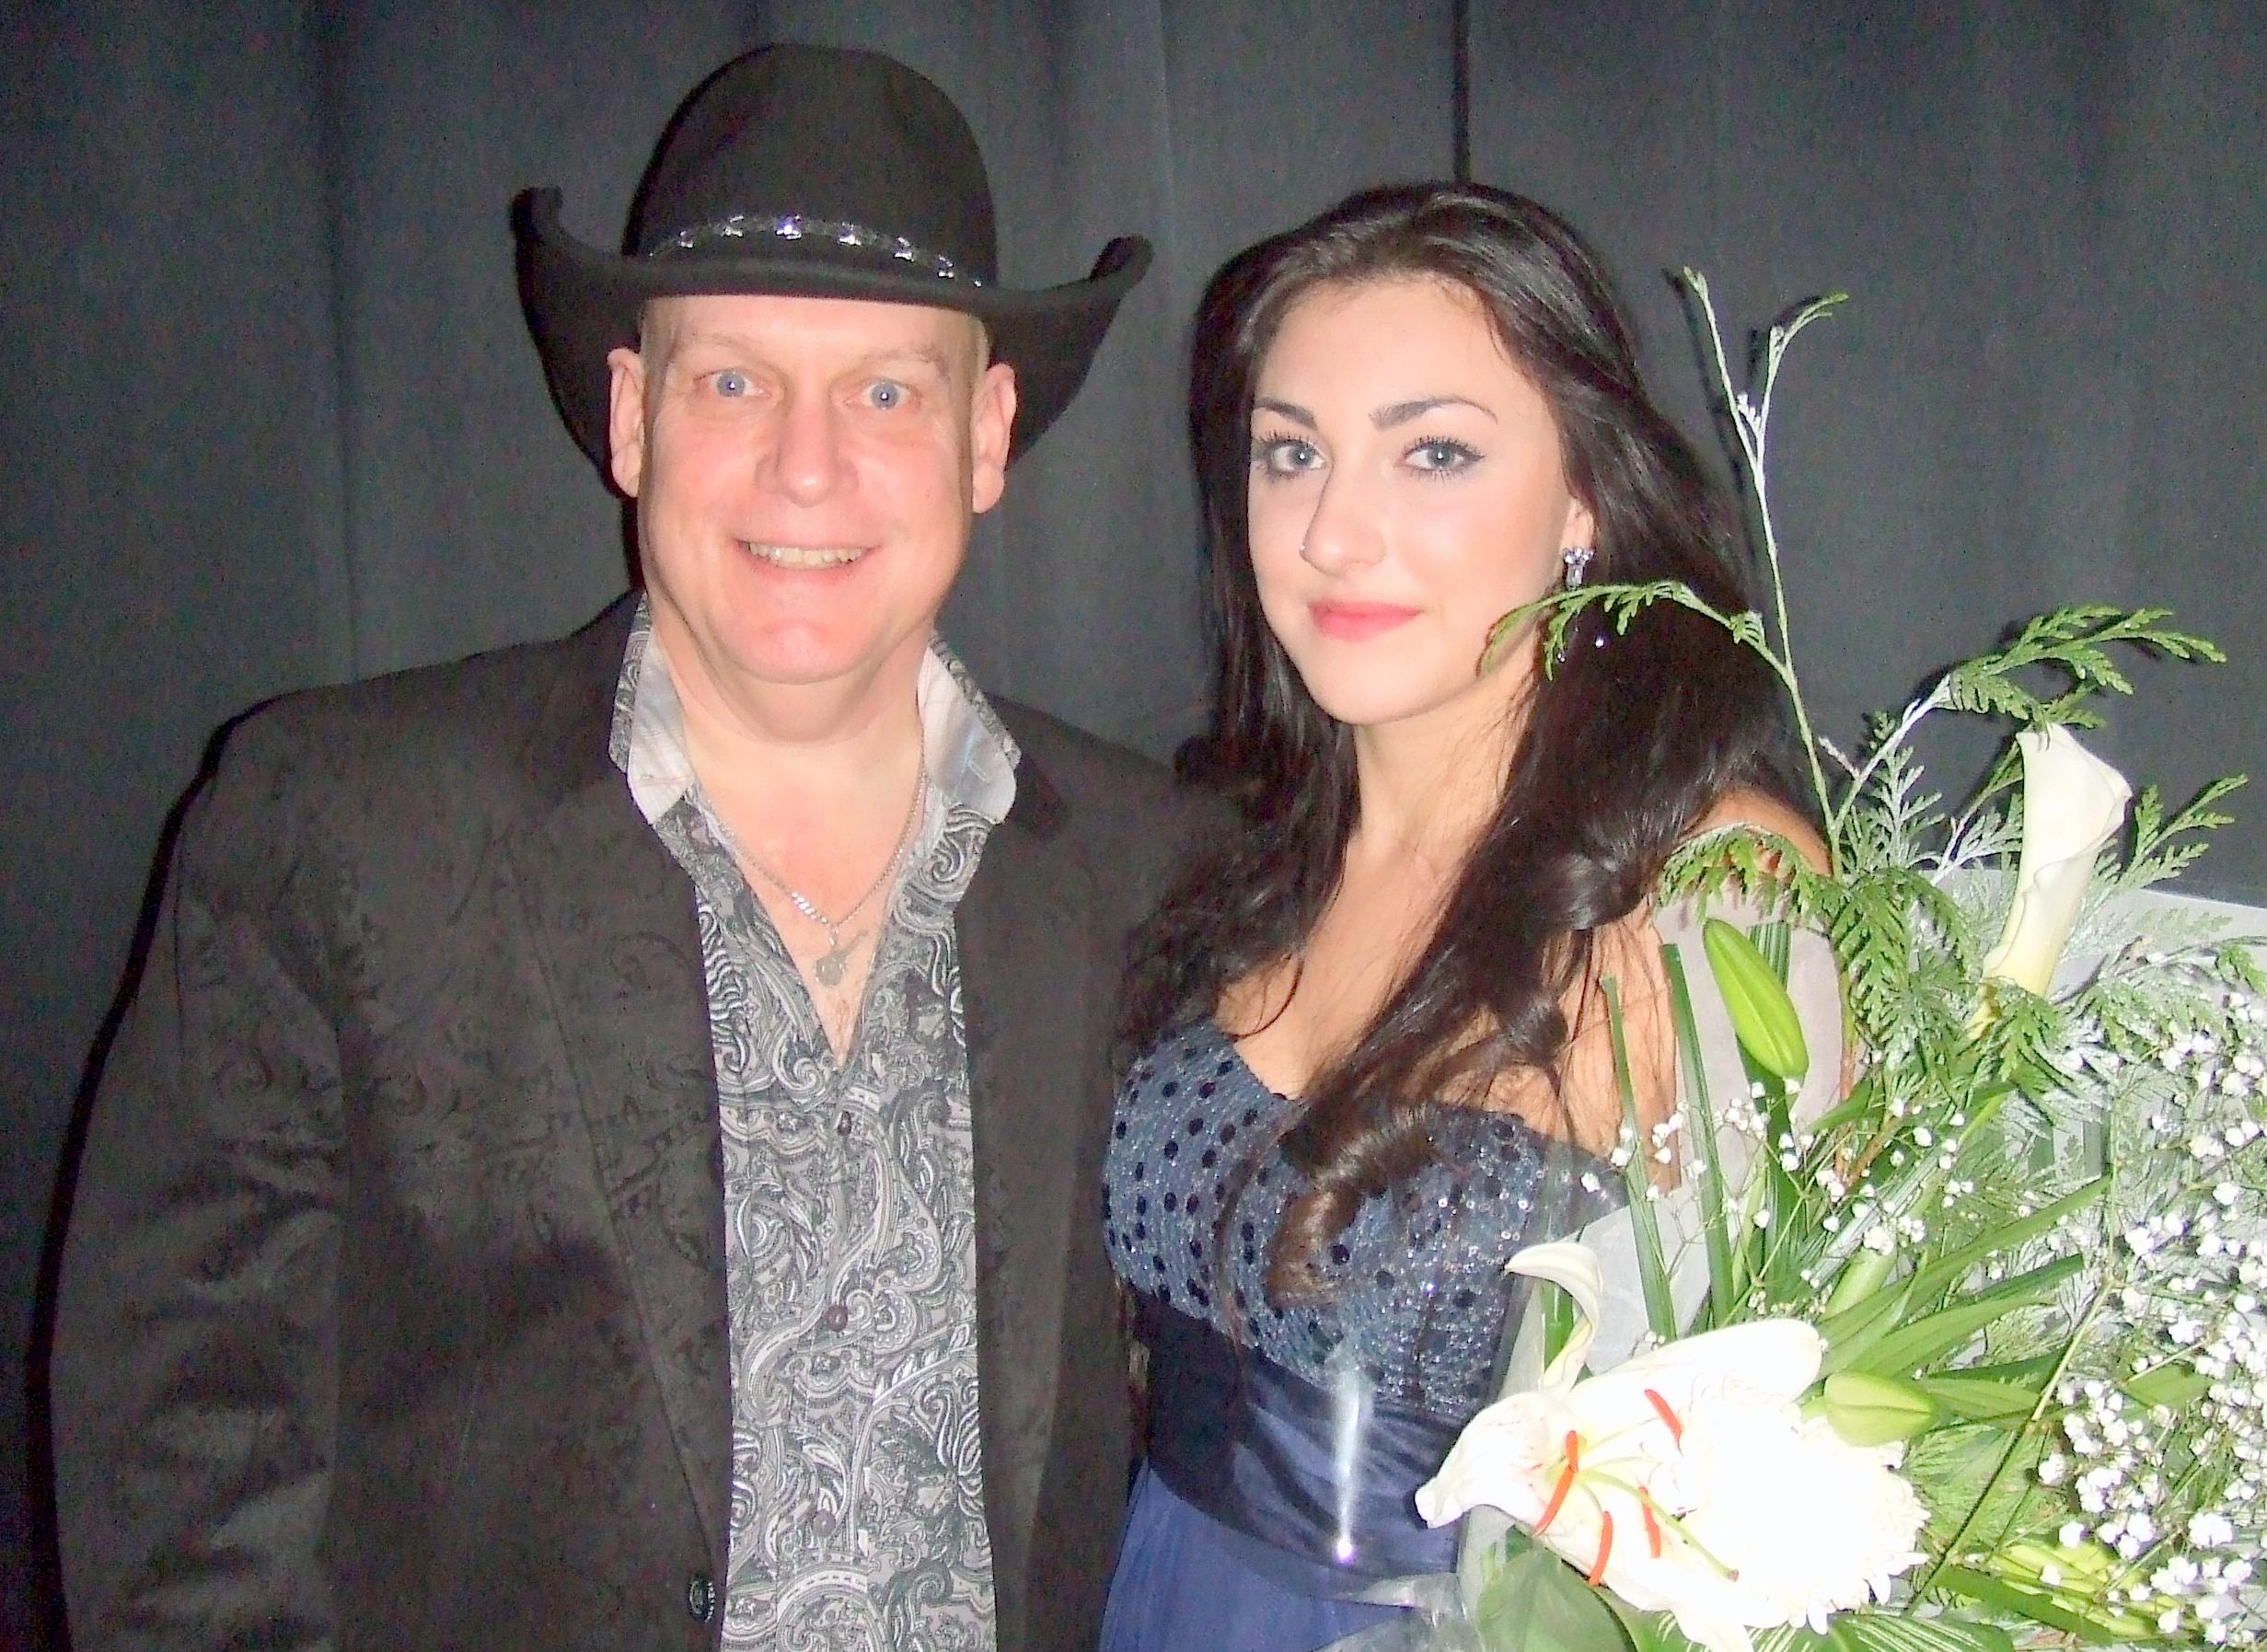 Vanessa Lavoie & Guy Marcoux